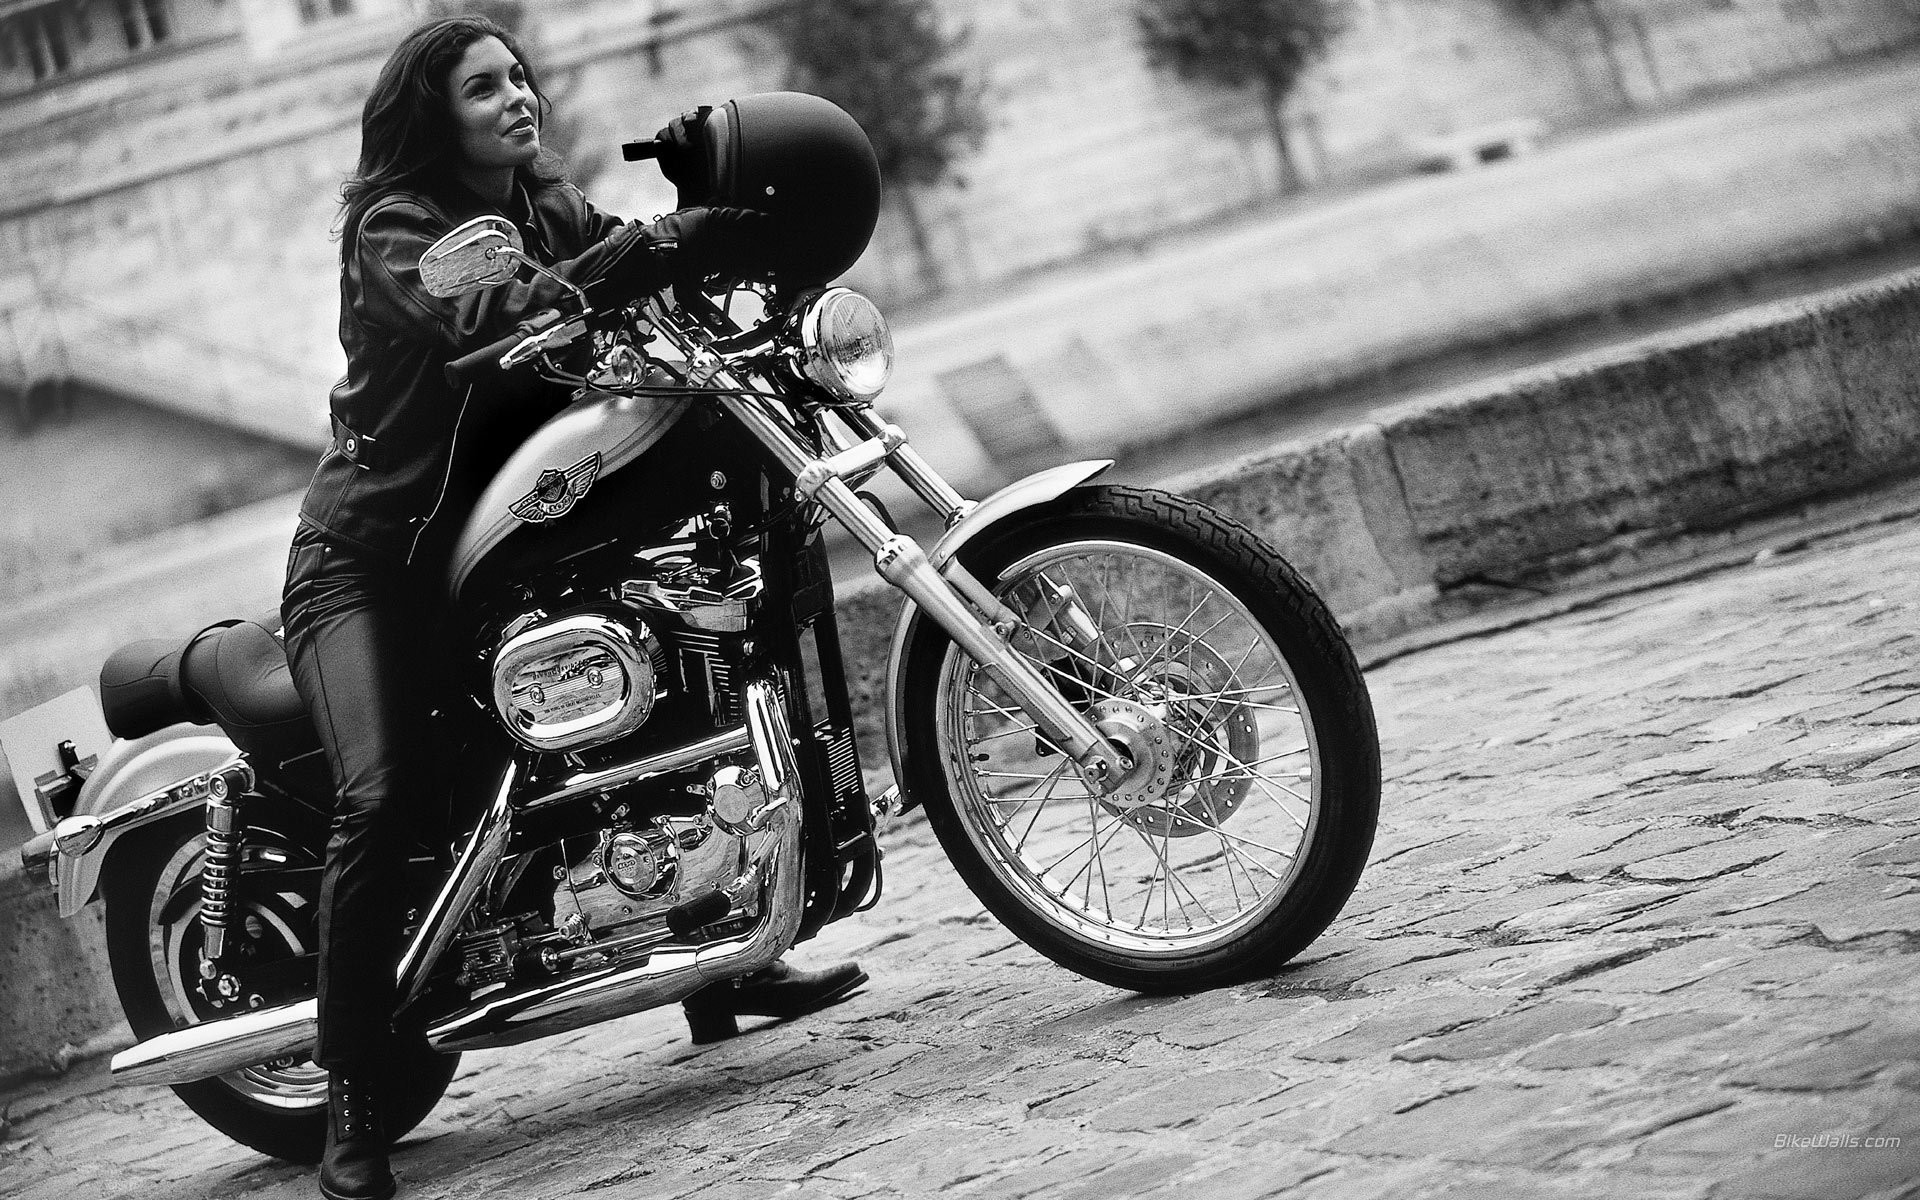 Harley davidson, motorcycle, bike, helmet, girl wallpaper (photos .